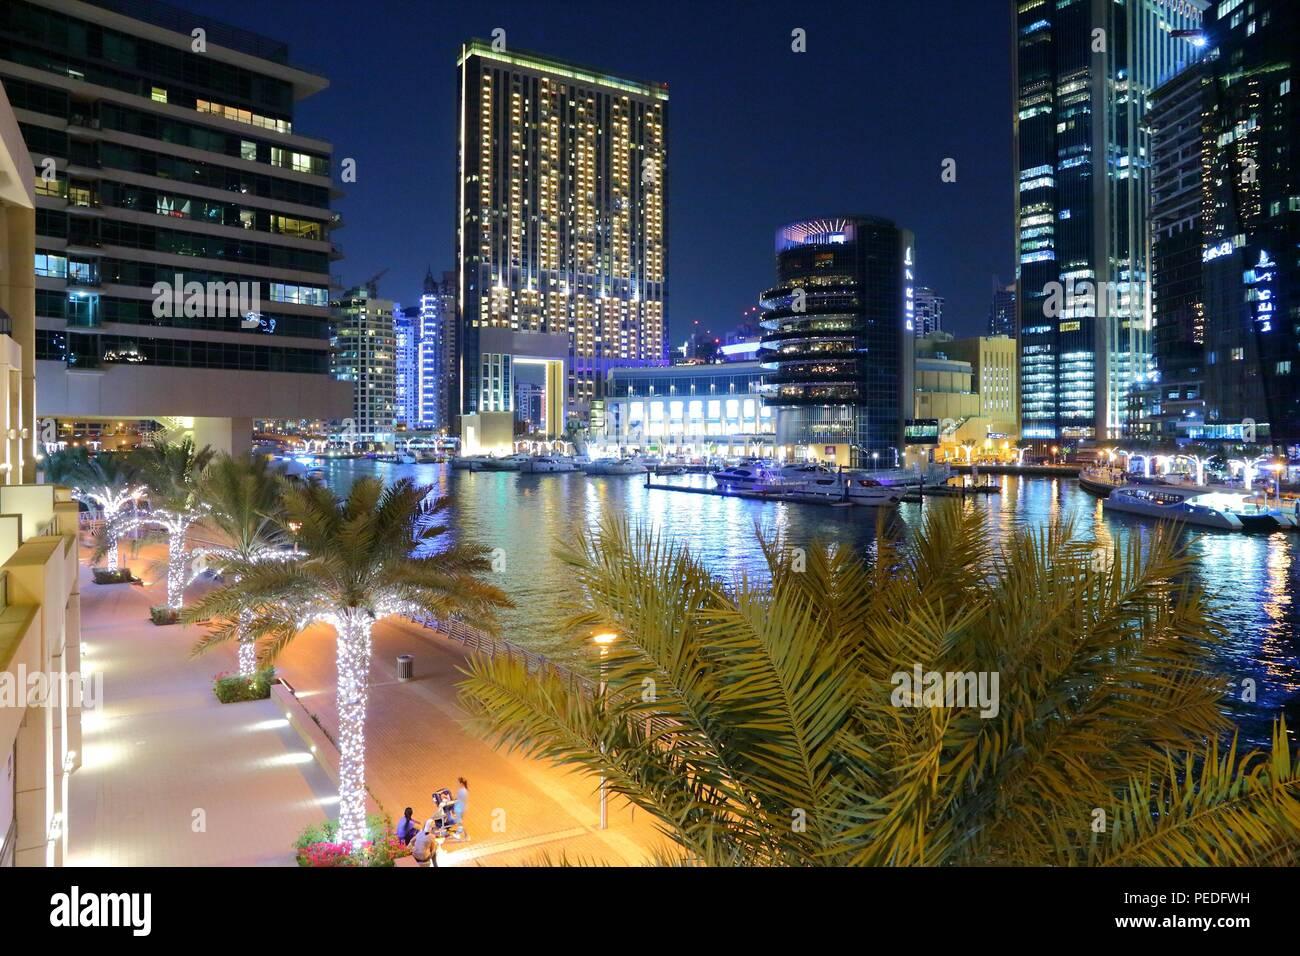 DUBAI, UAE - NOVEMBER 23, 2017: Night view of Dubai Marina, UAE. Dubai has 14.9 million annual tourists. - Stock Image